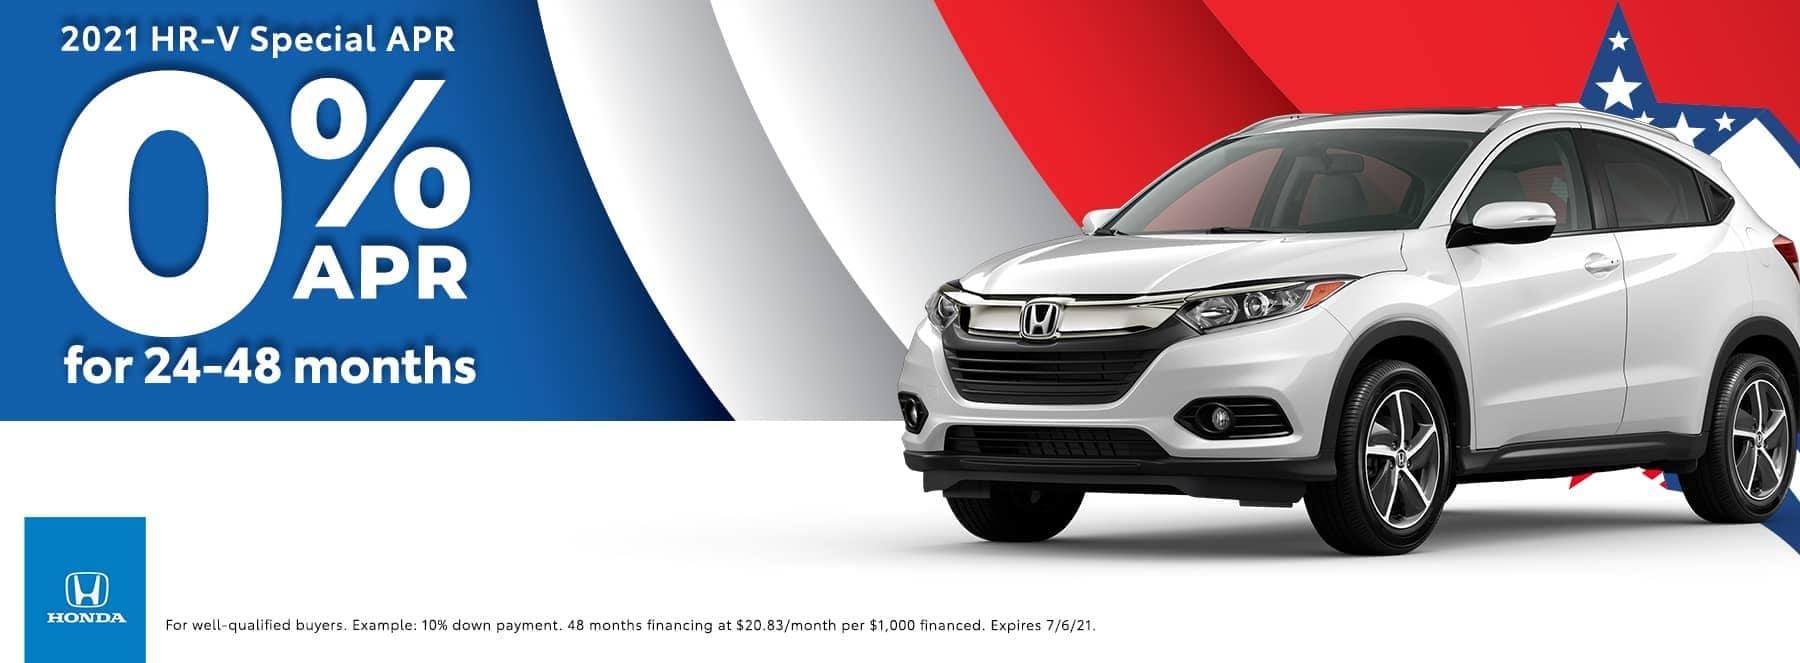 Honda of Newnan - 2021 HR-V Special - 0% APR for 24-48 months